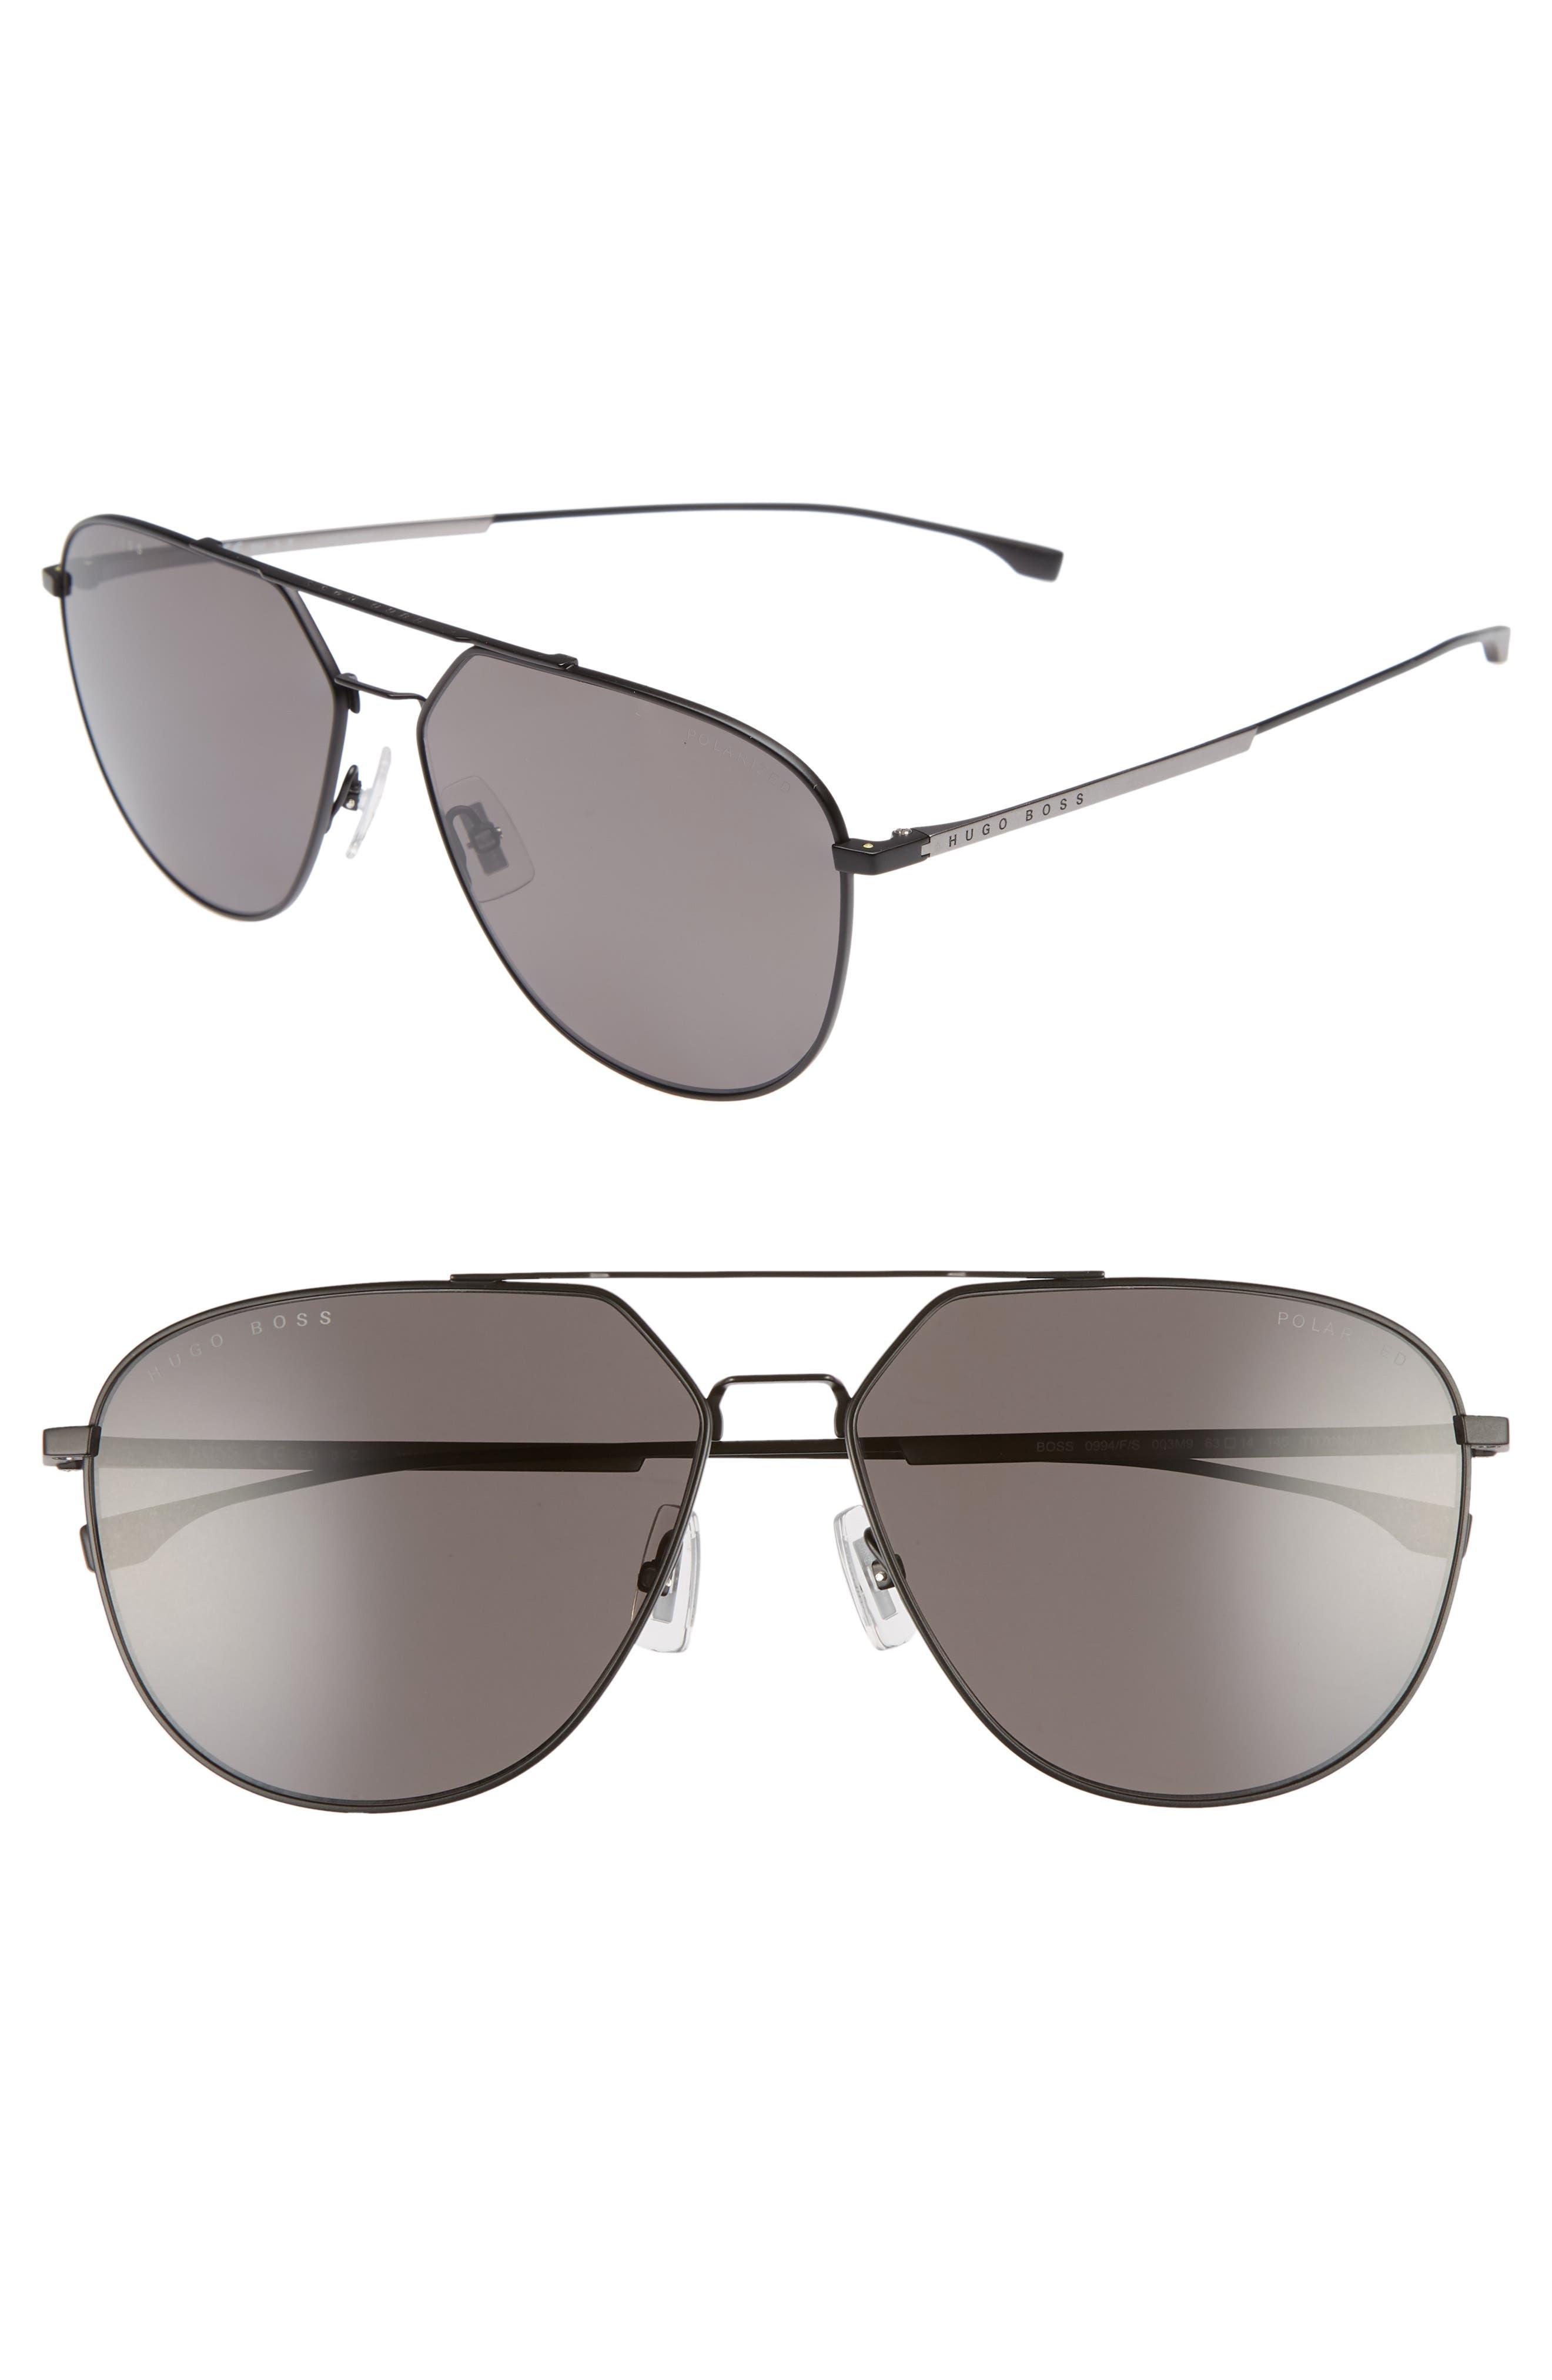 63mm Polarized Aviator Sunglasses,                         Main,                         color, Matte Black